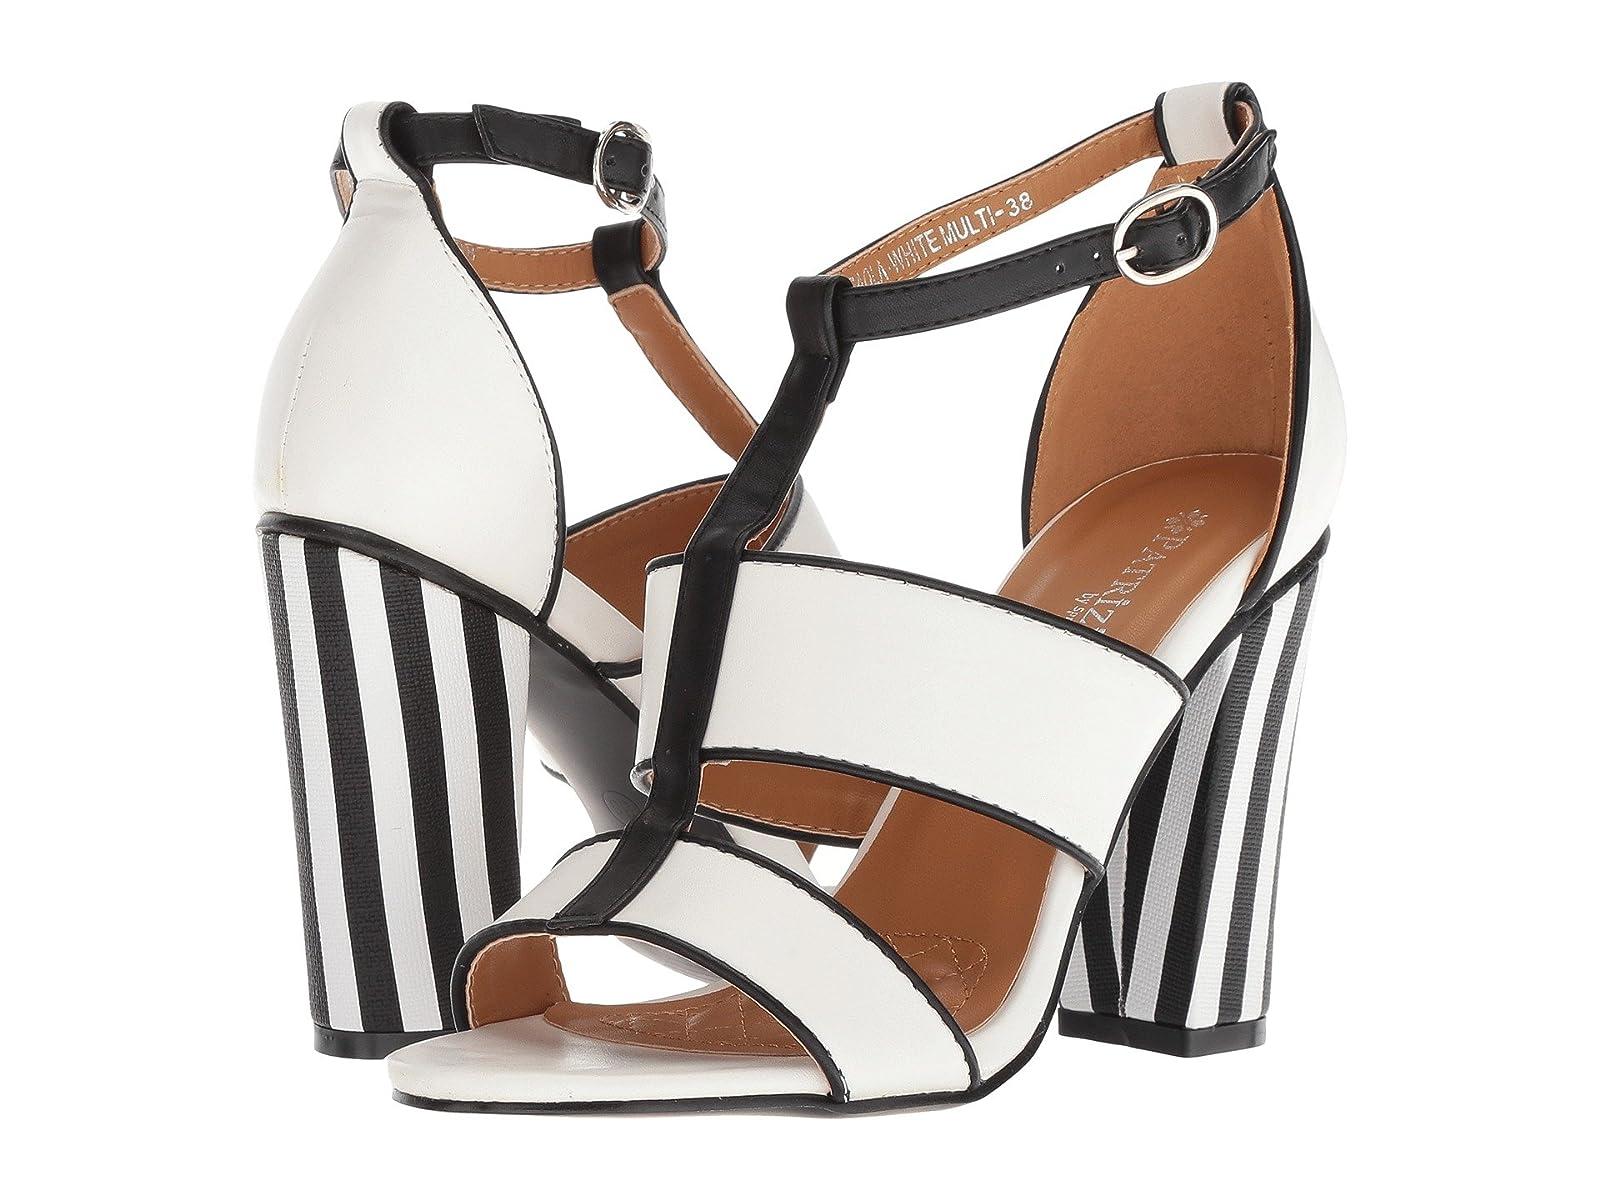 PATRIZIA PaolaCheap and distinctive eye-catching shoes